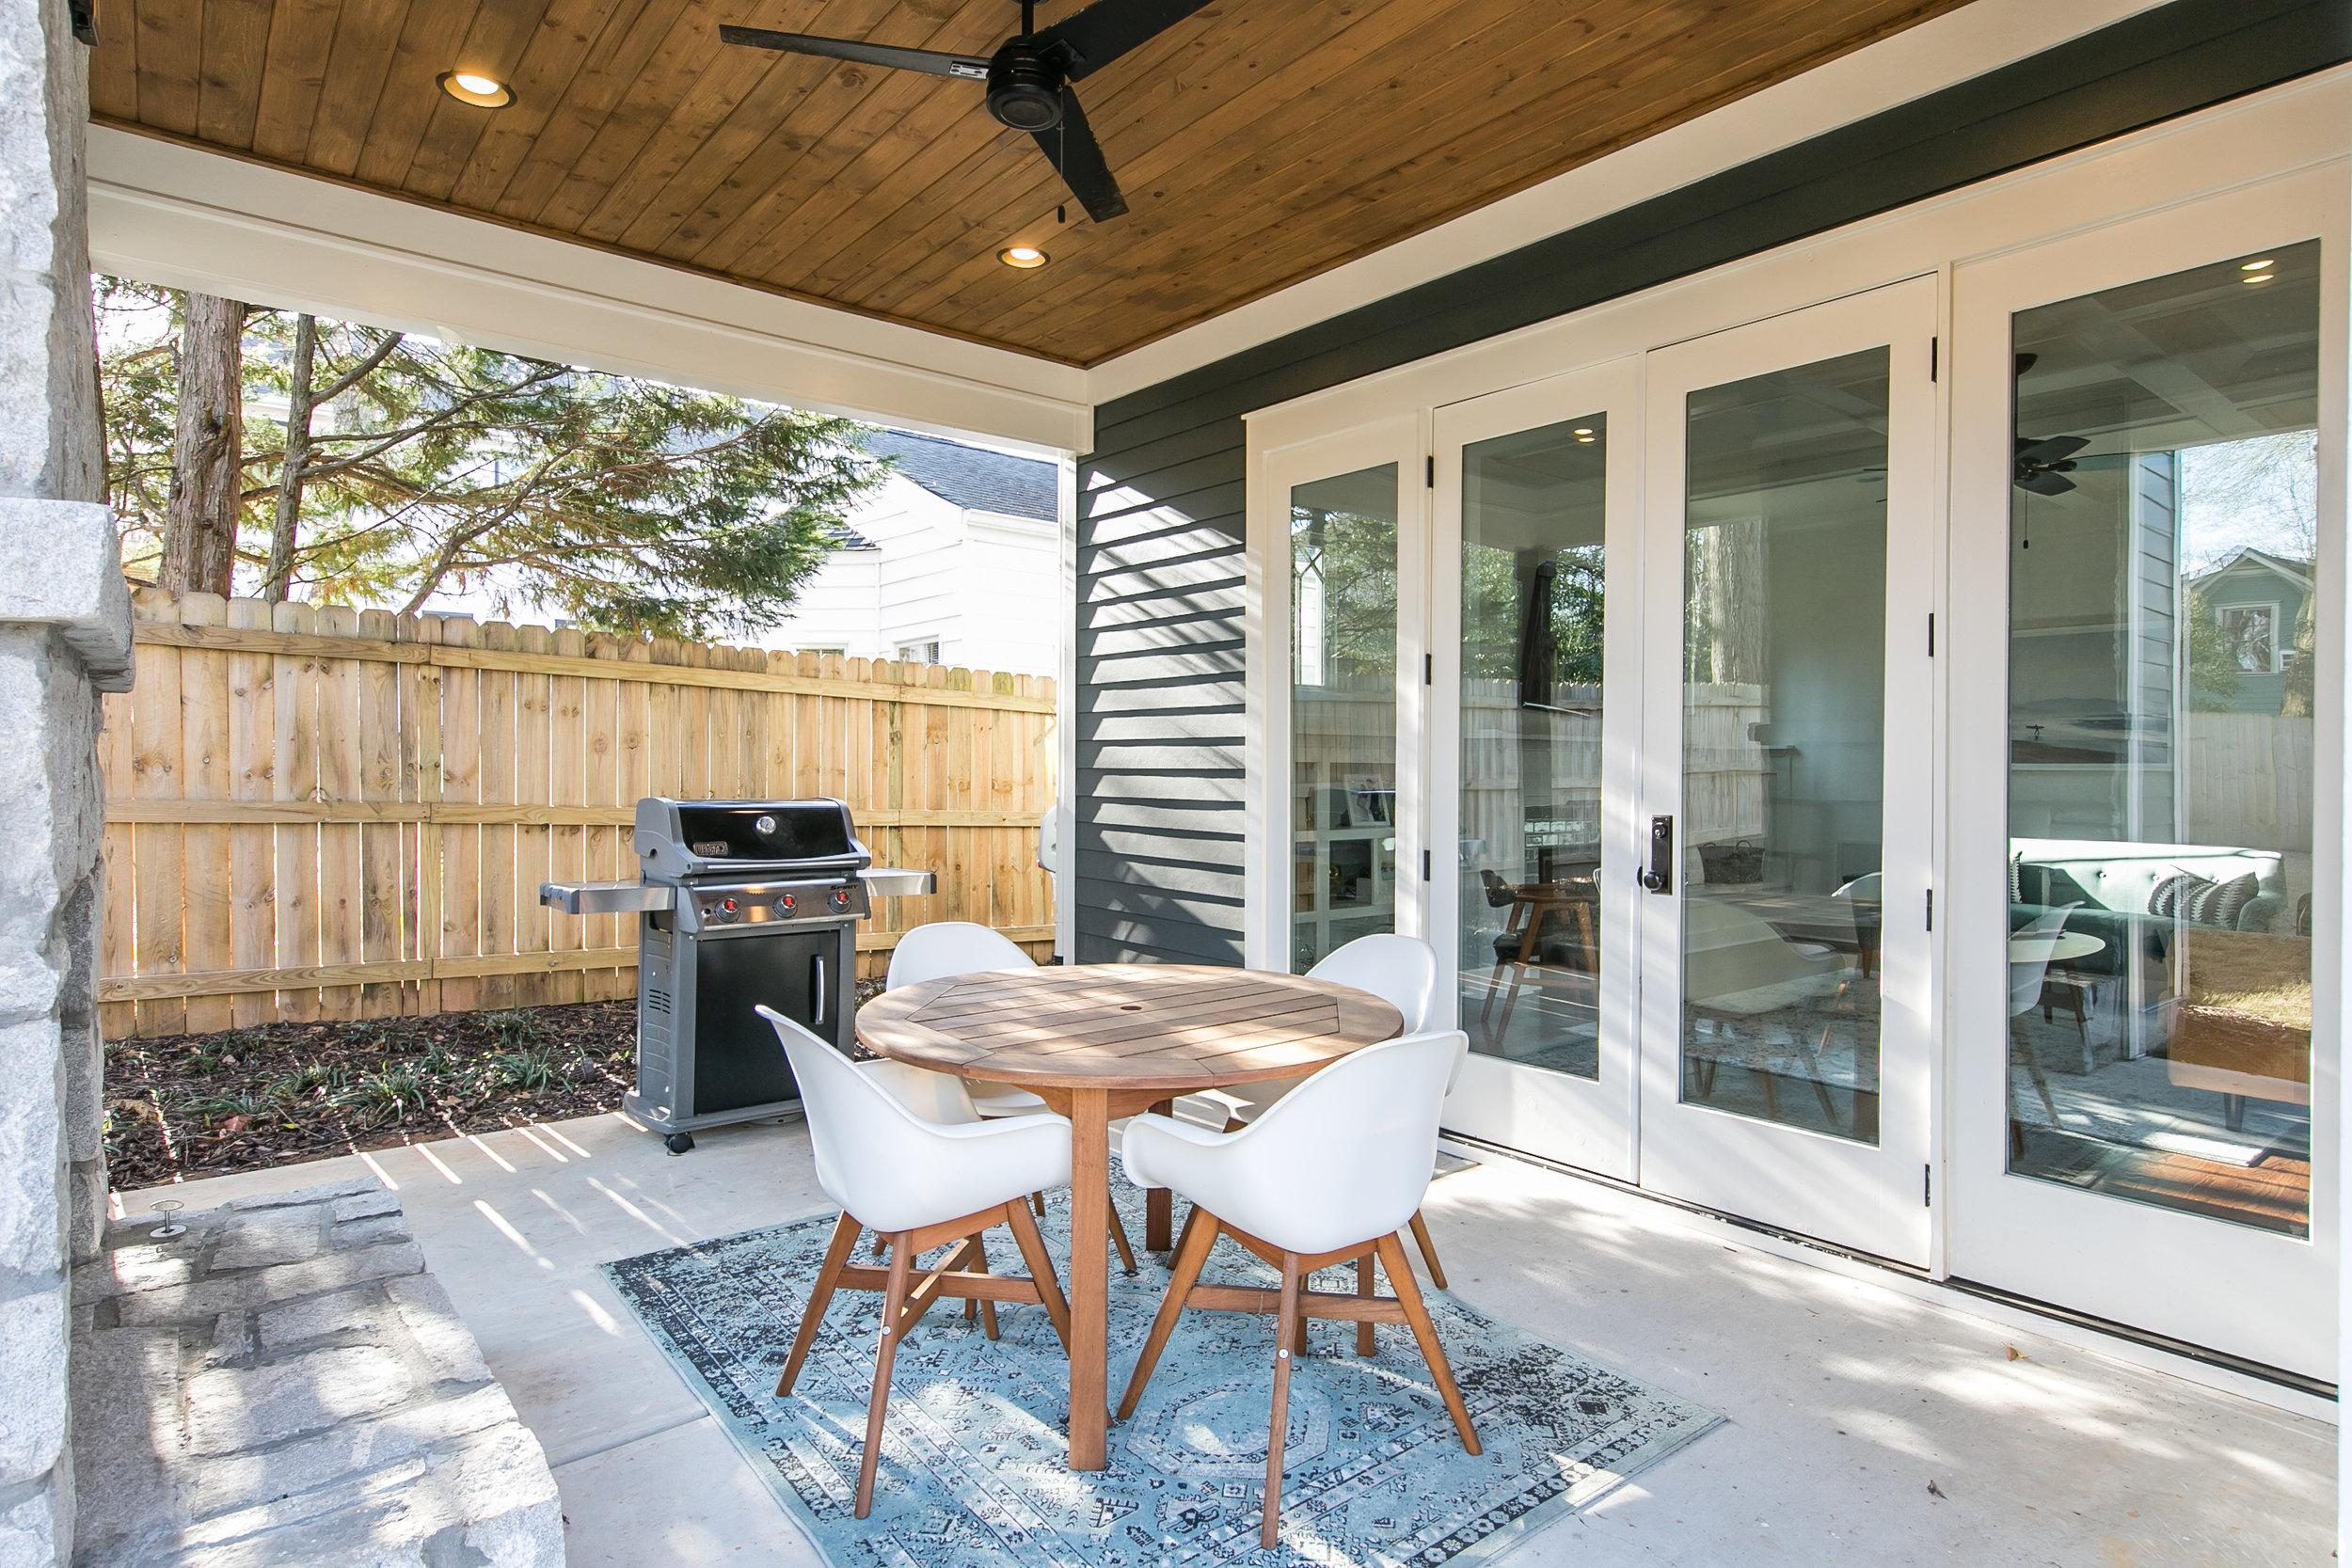 239 Greenwood-Back porch 1.jpg